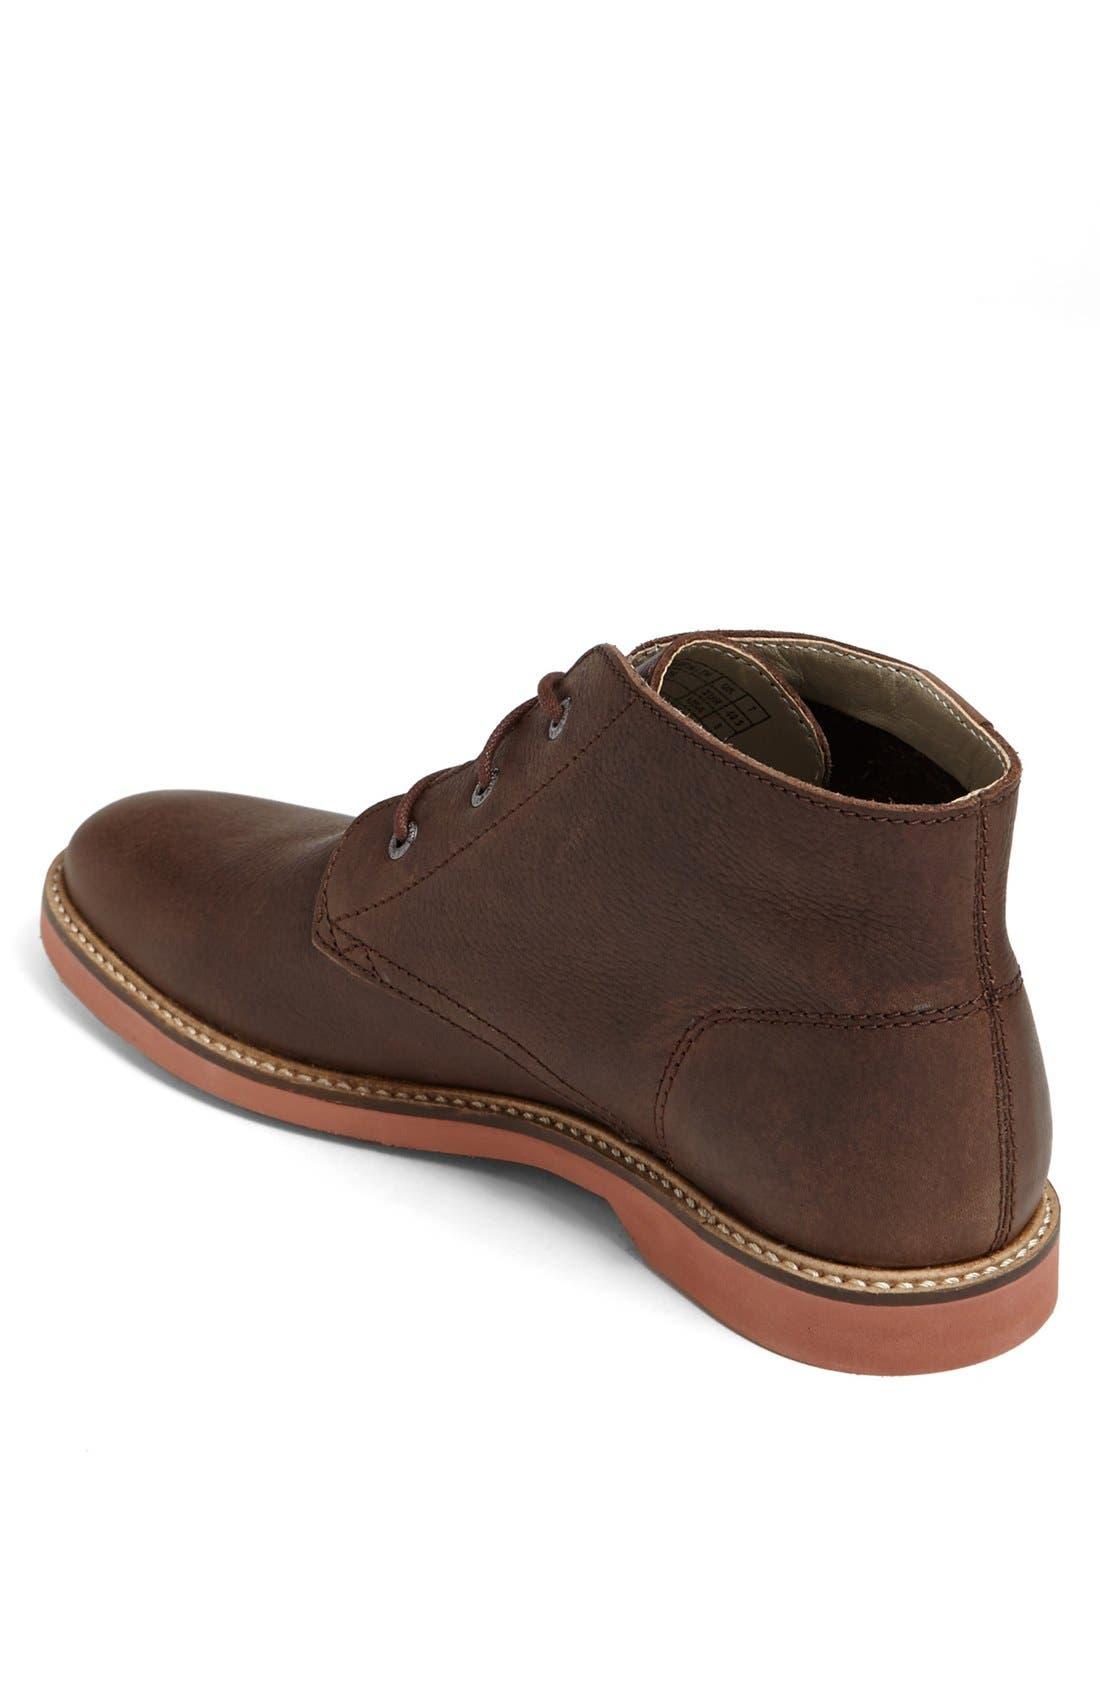 Alternate Image 2  - Lacoste 'Sherbrooke Hi' Boot